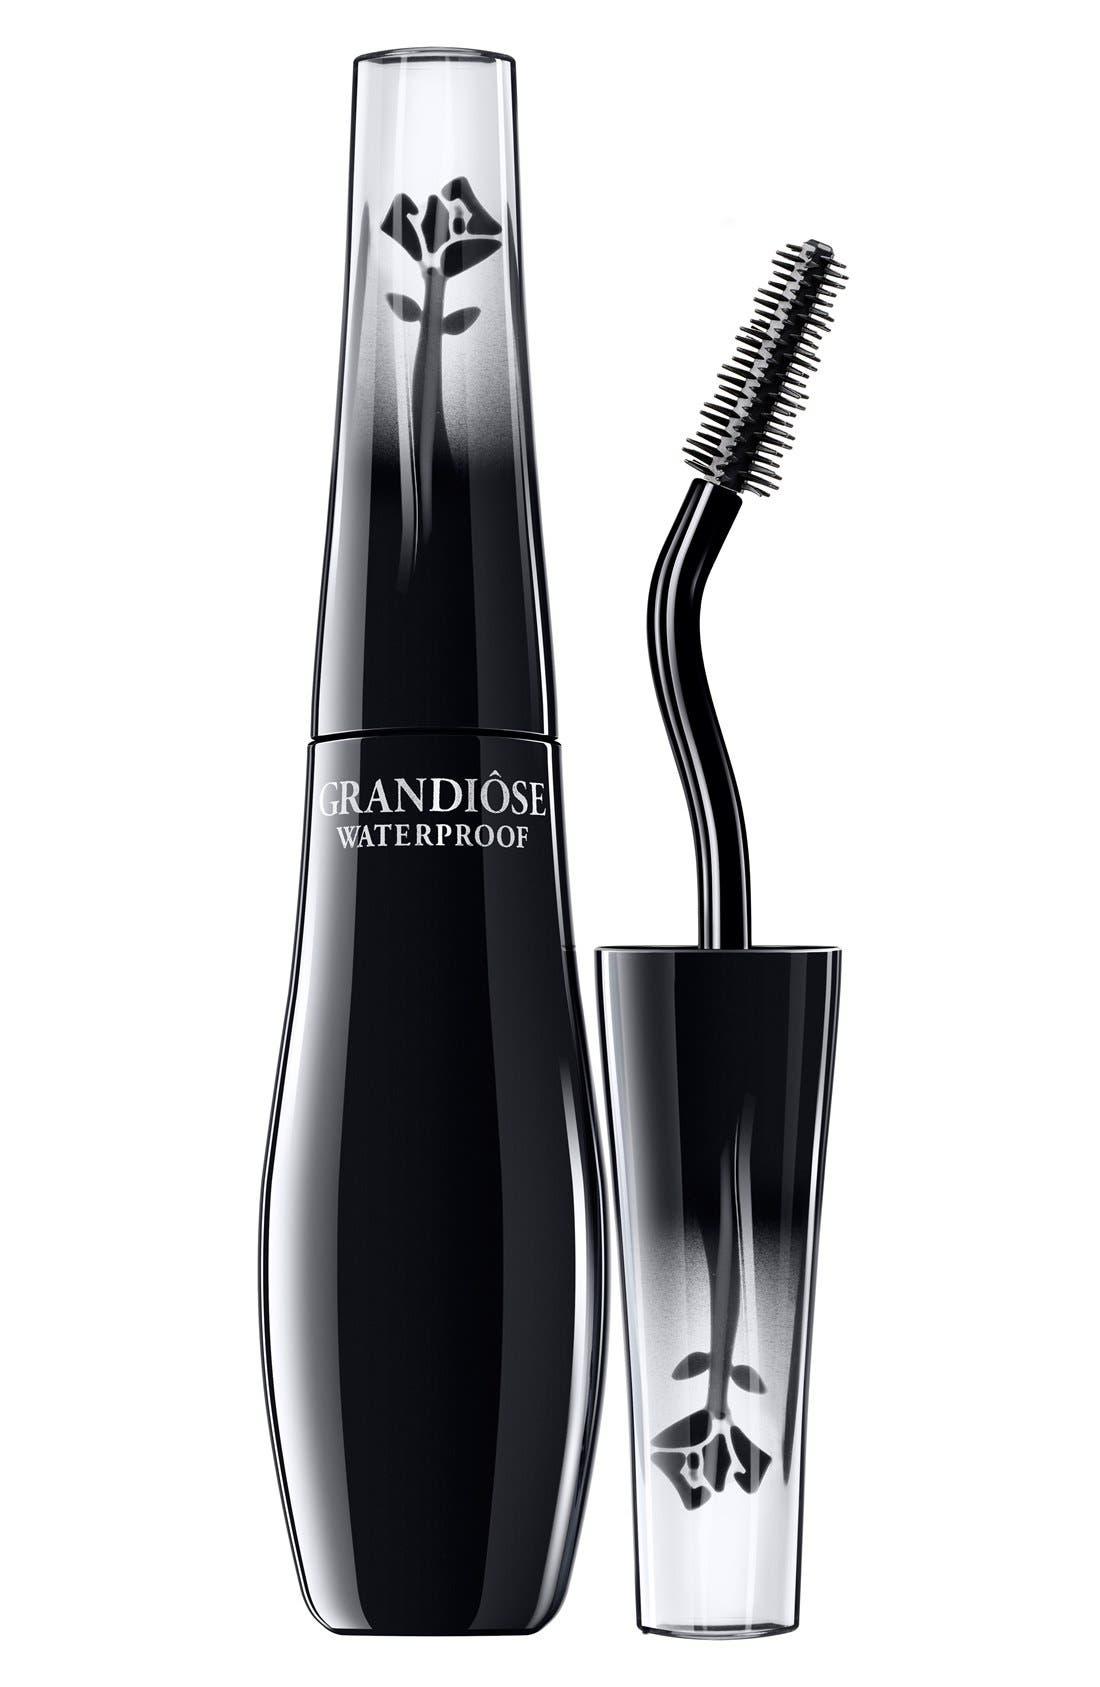 Grandiose Multi-Benefit Lengthening, Lifting and Volumizing Waterproof Mascara,                         Main,                         color, 001